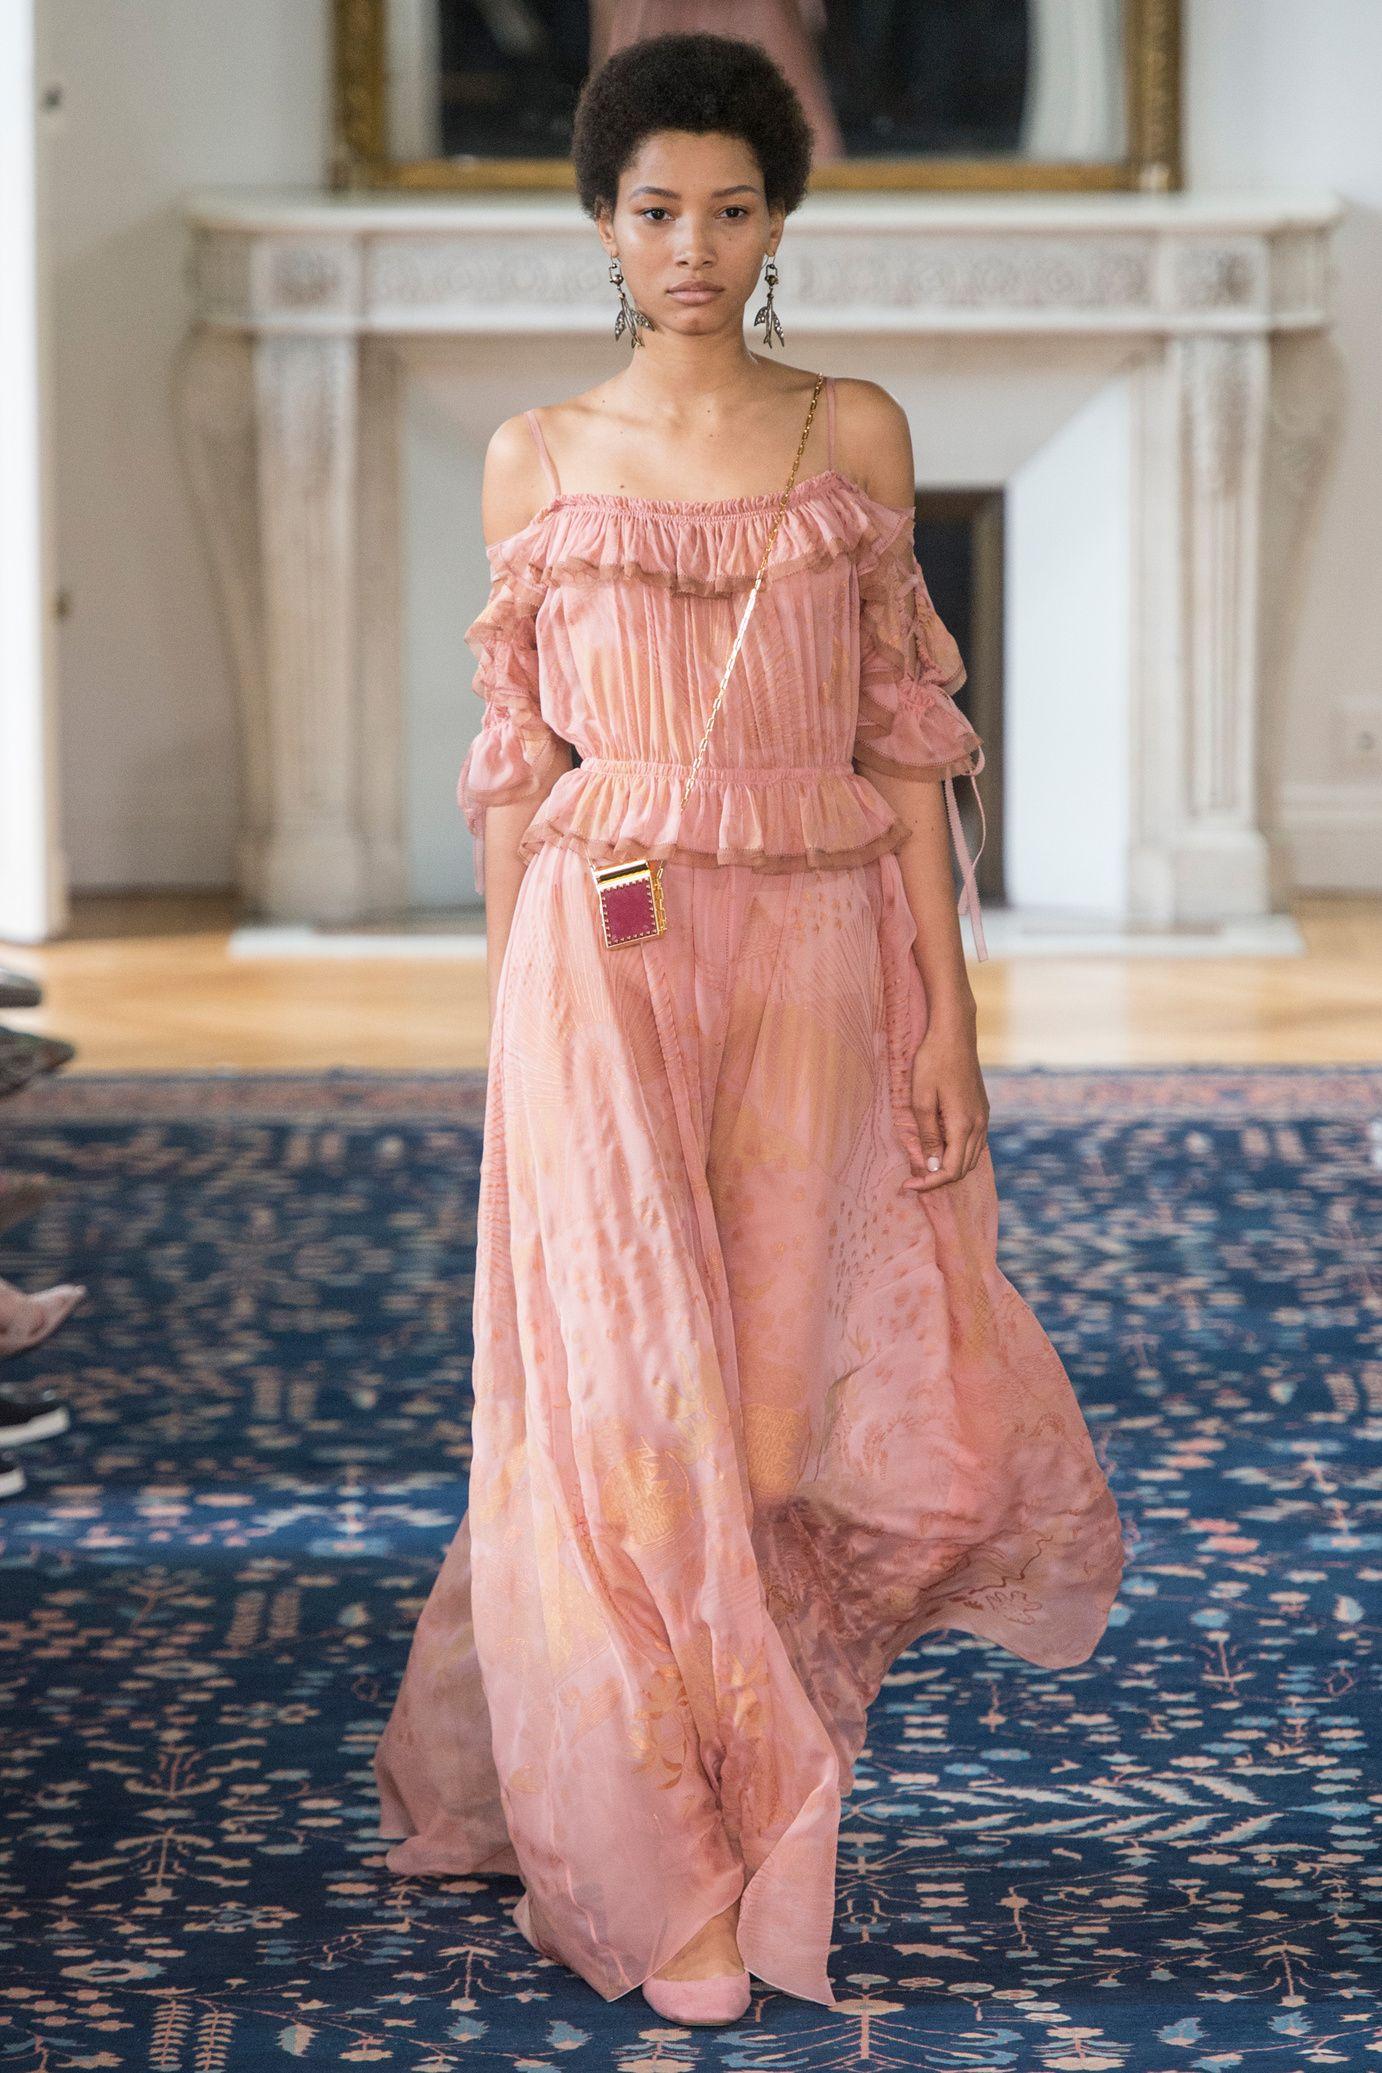 Défilé Valentino: Printemps-été 2017 | Moda italiana, Color rosa y ...